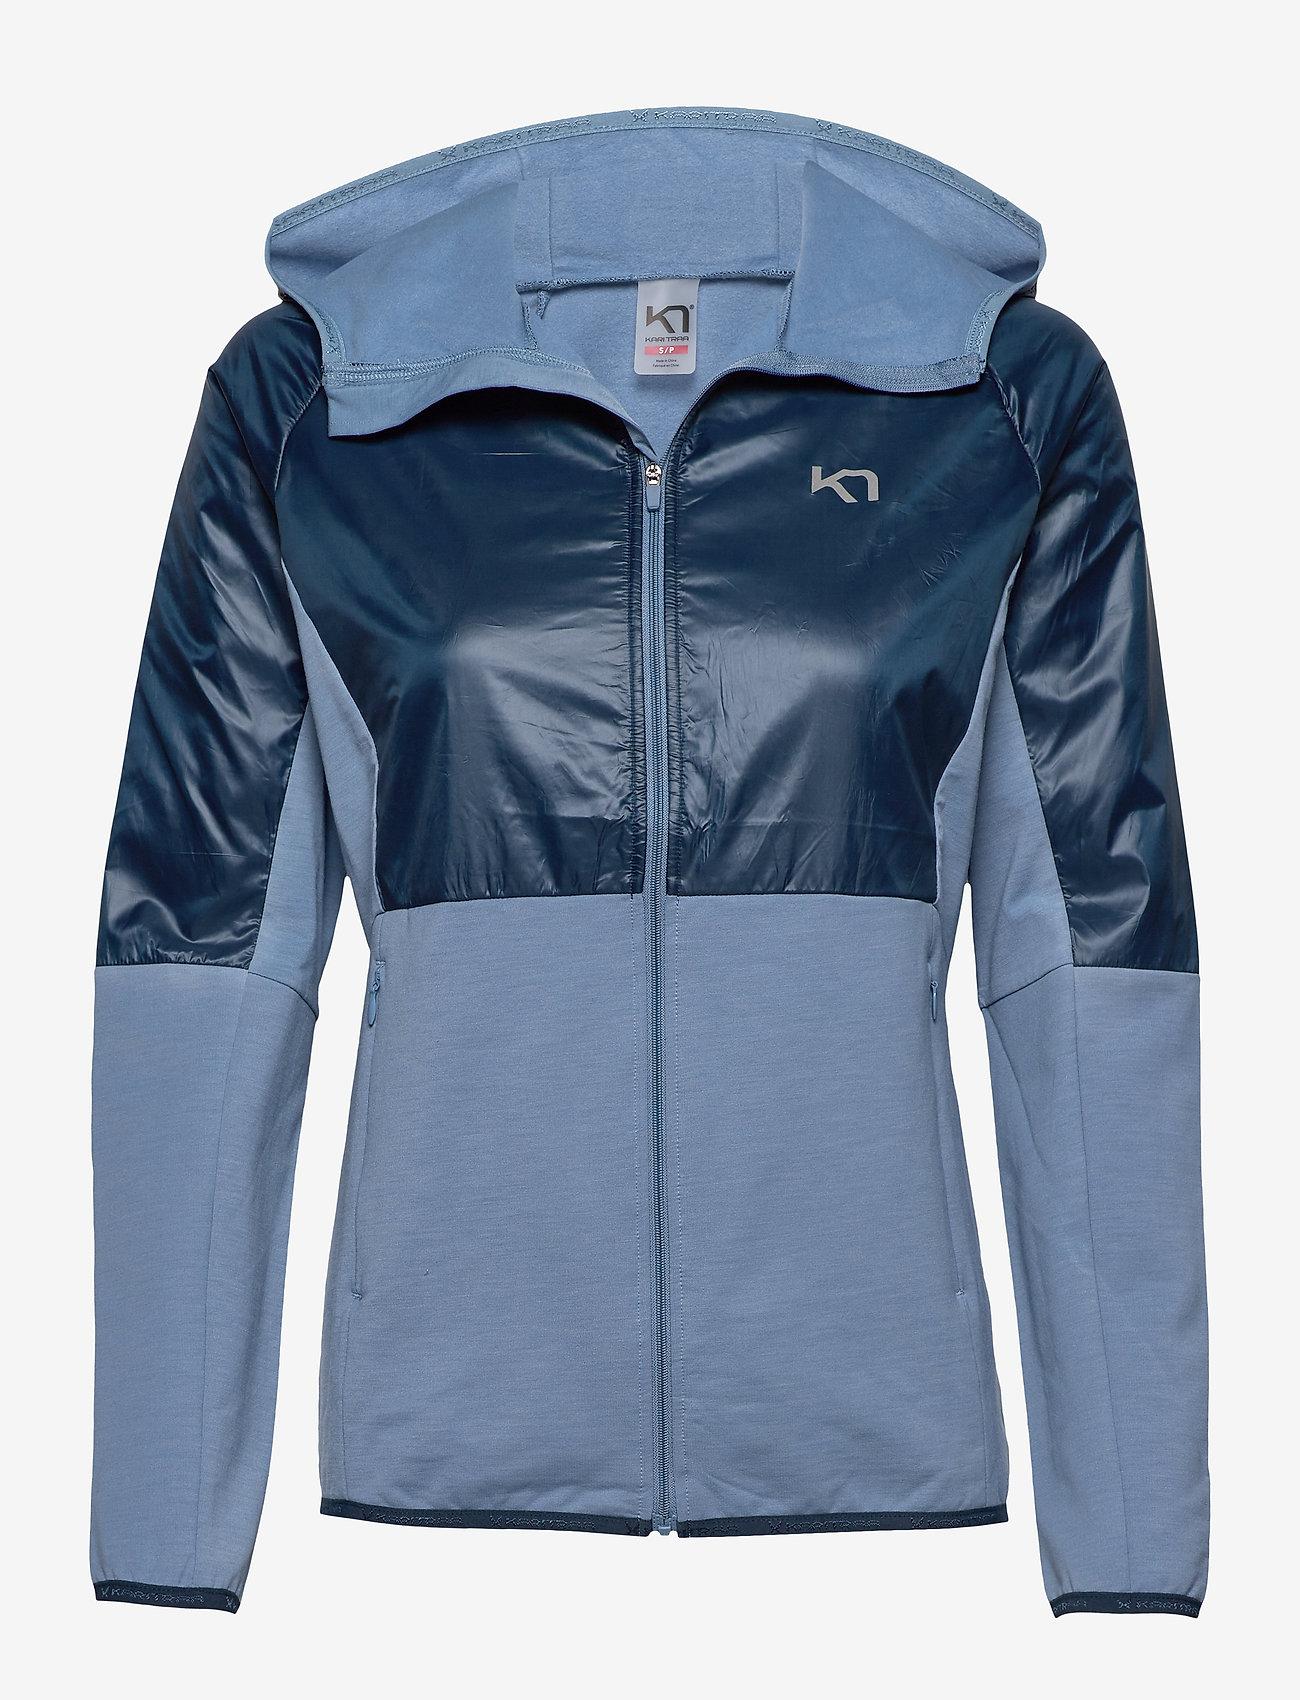 Kari Traa - SVALA HYBRID - training jackets - denim - 0